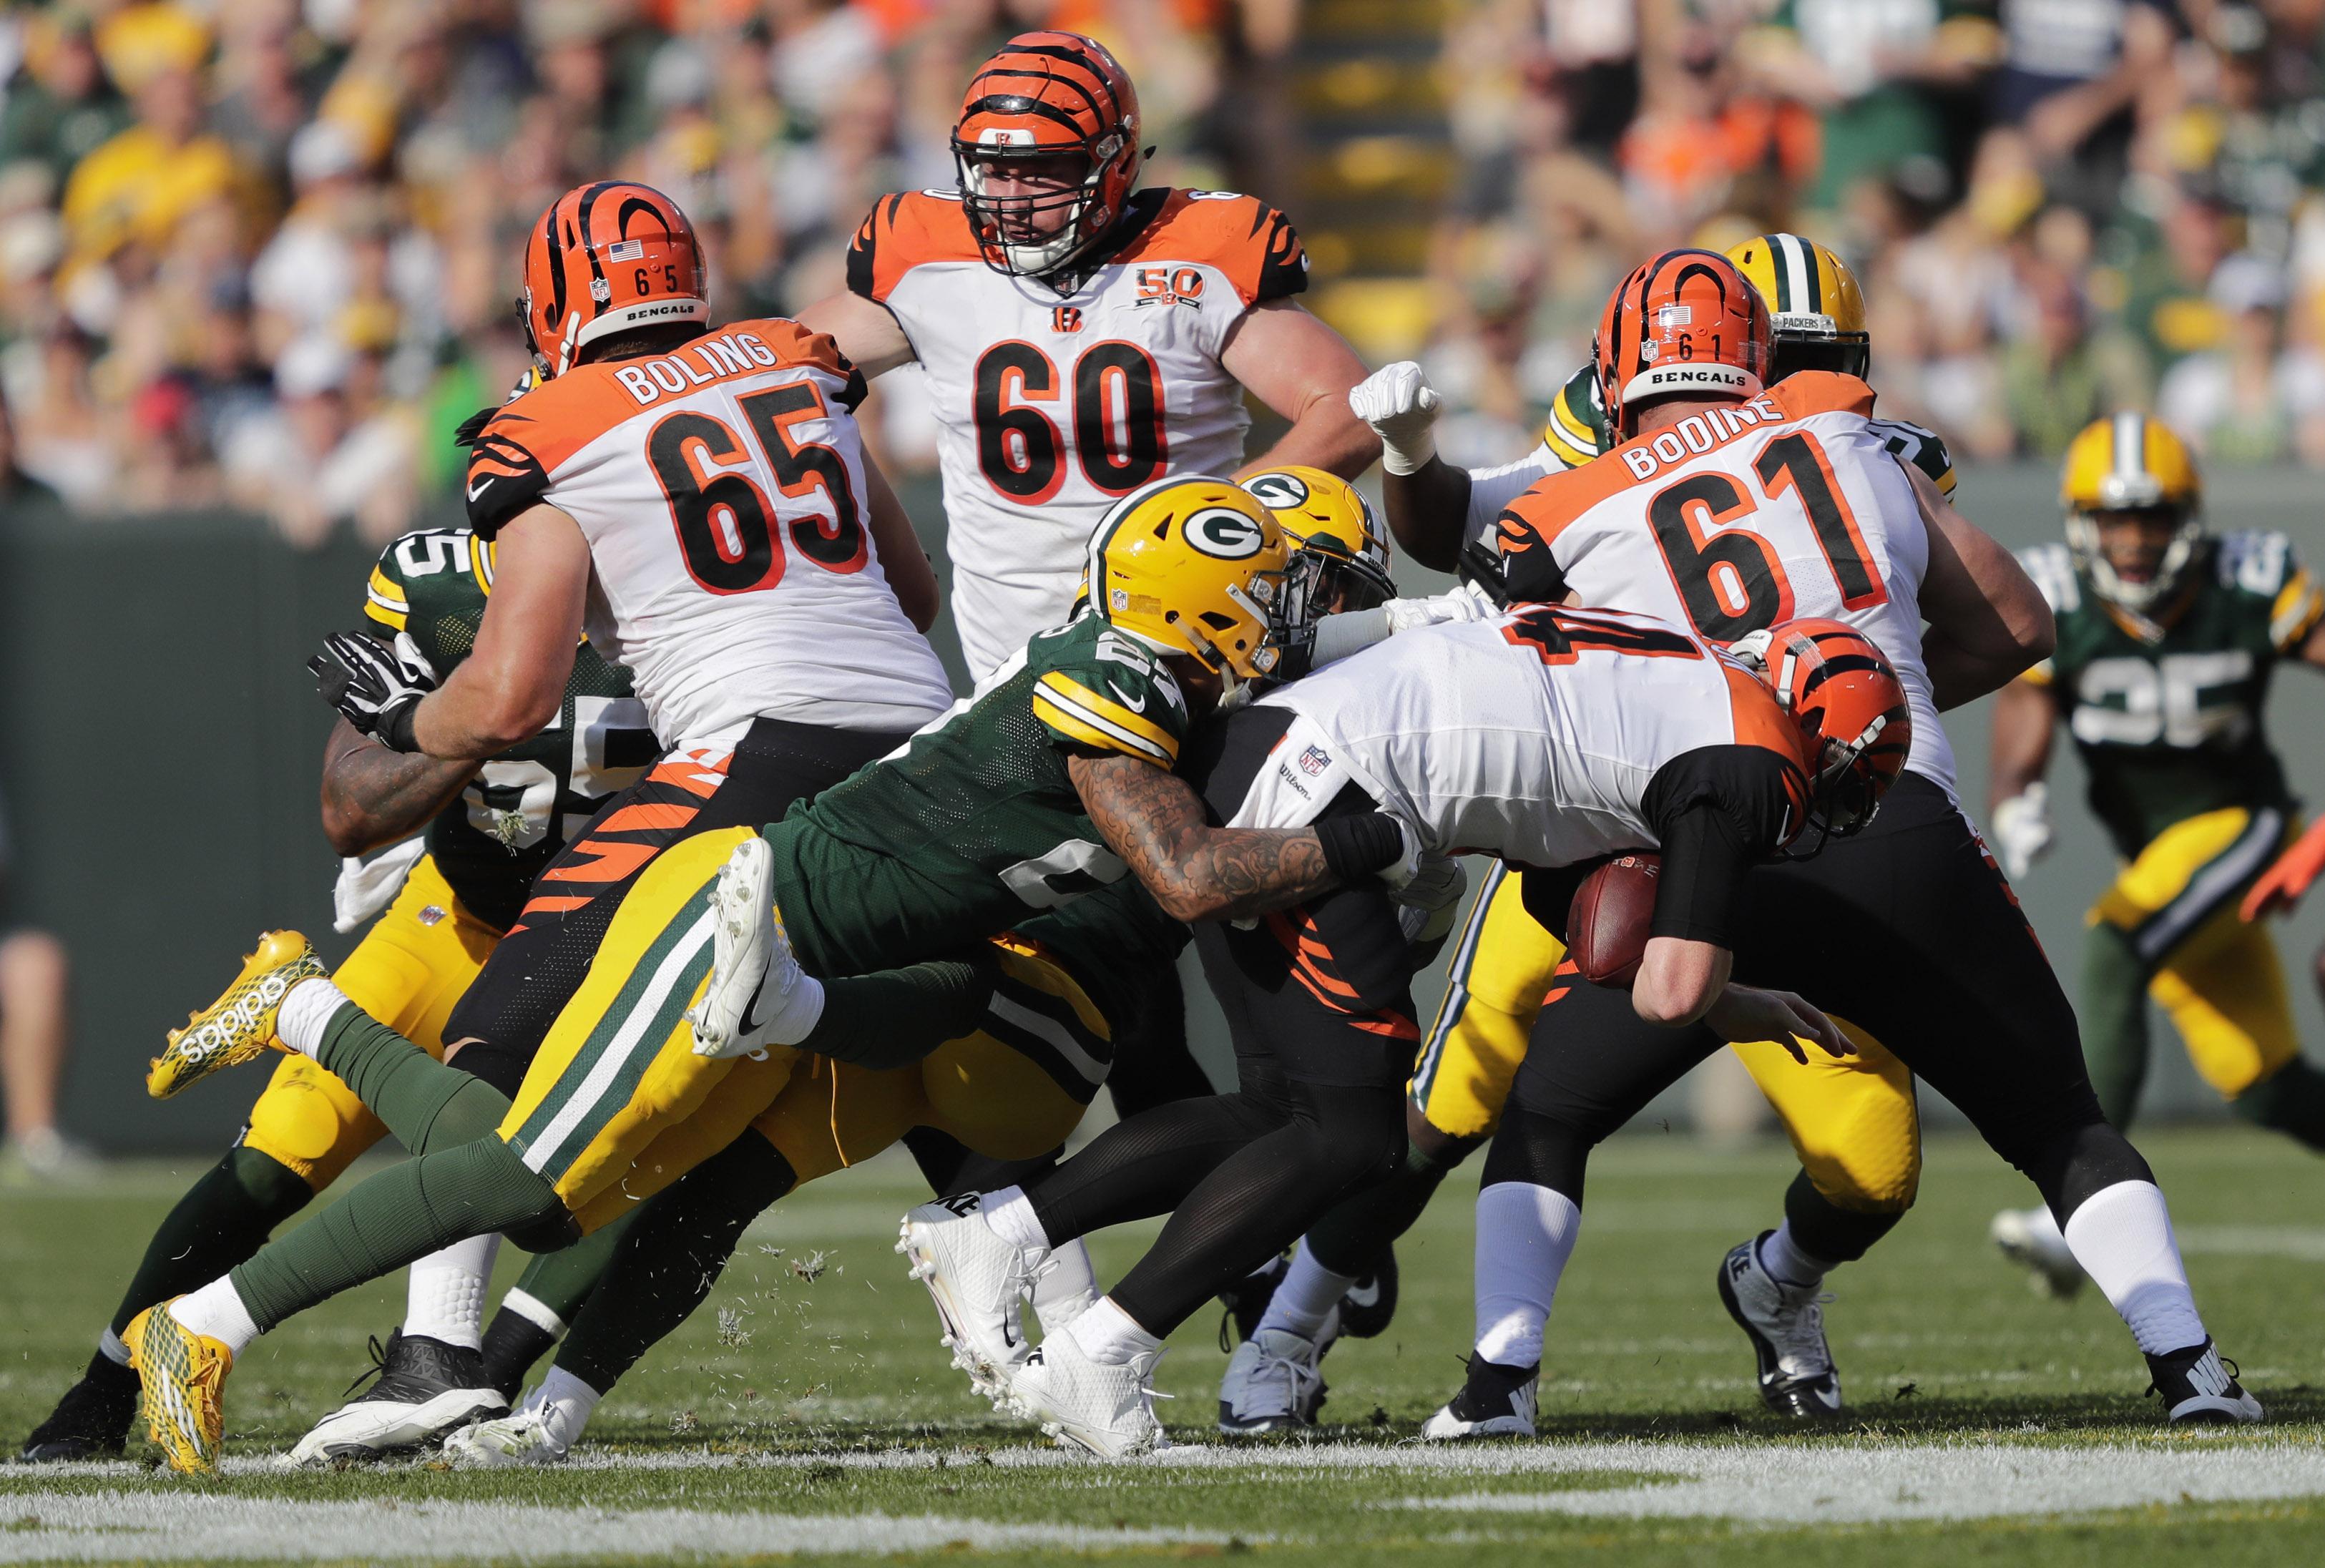 NFL: Cincinnati Bengals at Green Bay Packers